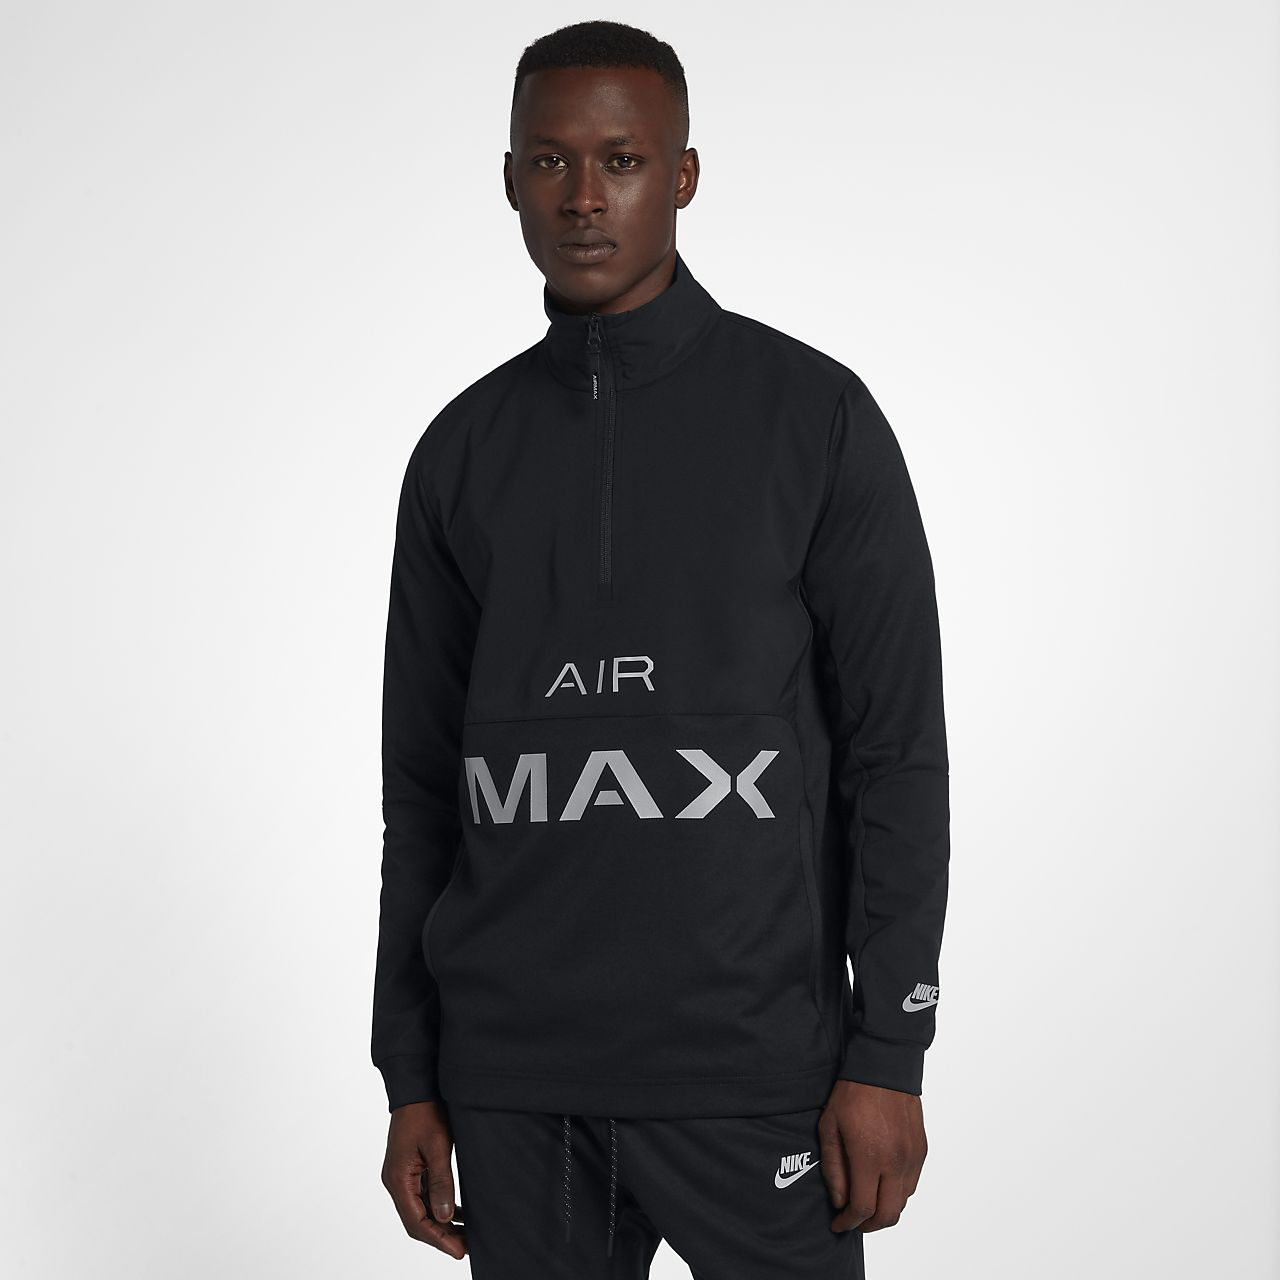 36e77184b08f Nike Sportswear Air Max Men s Jacket. Nike.com AU